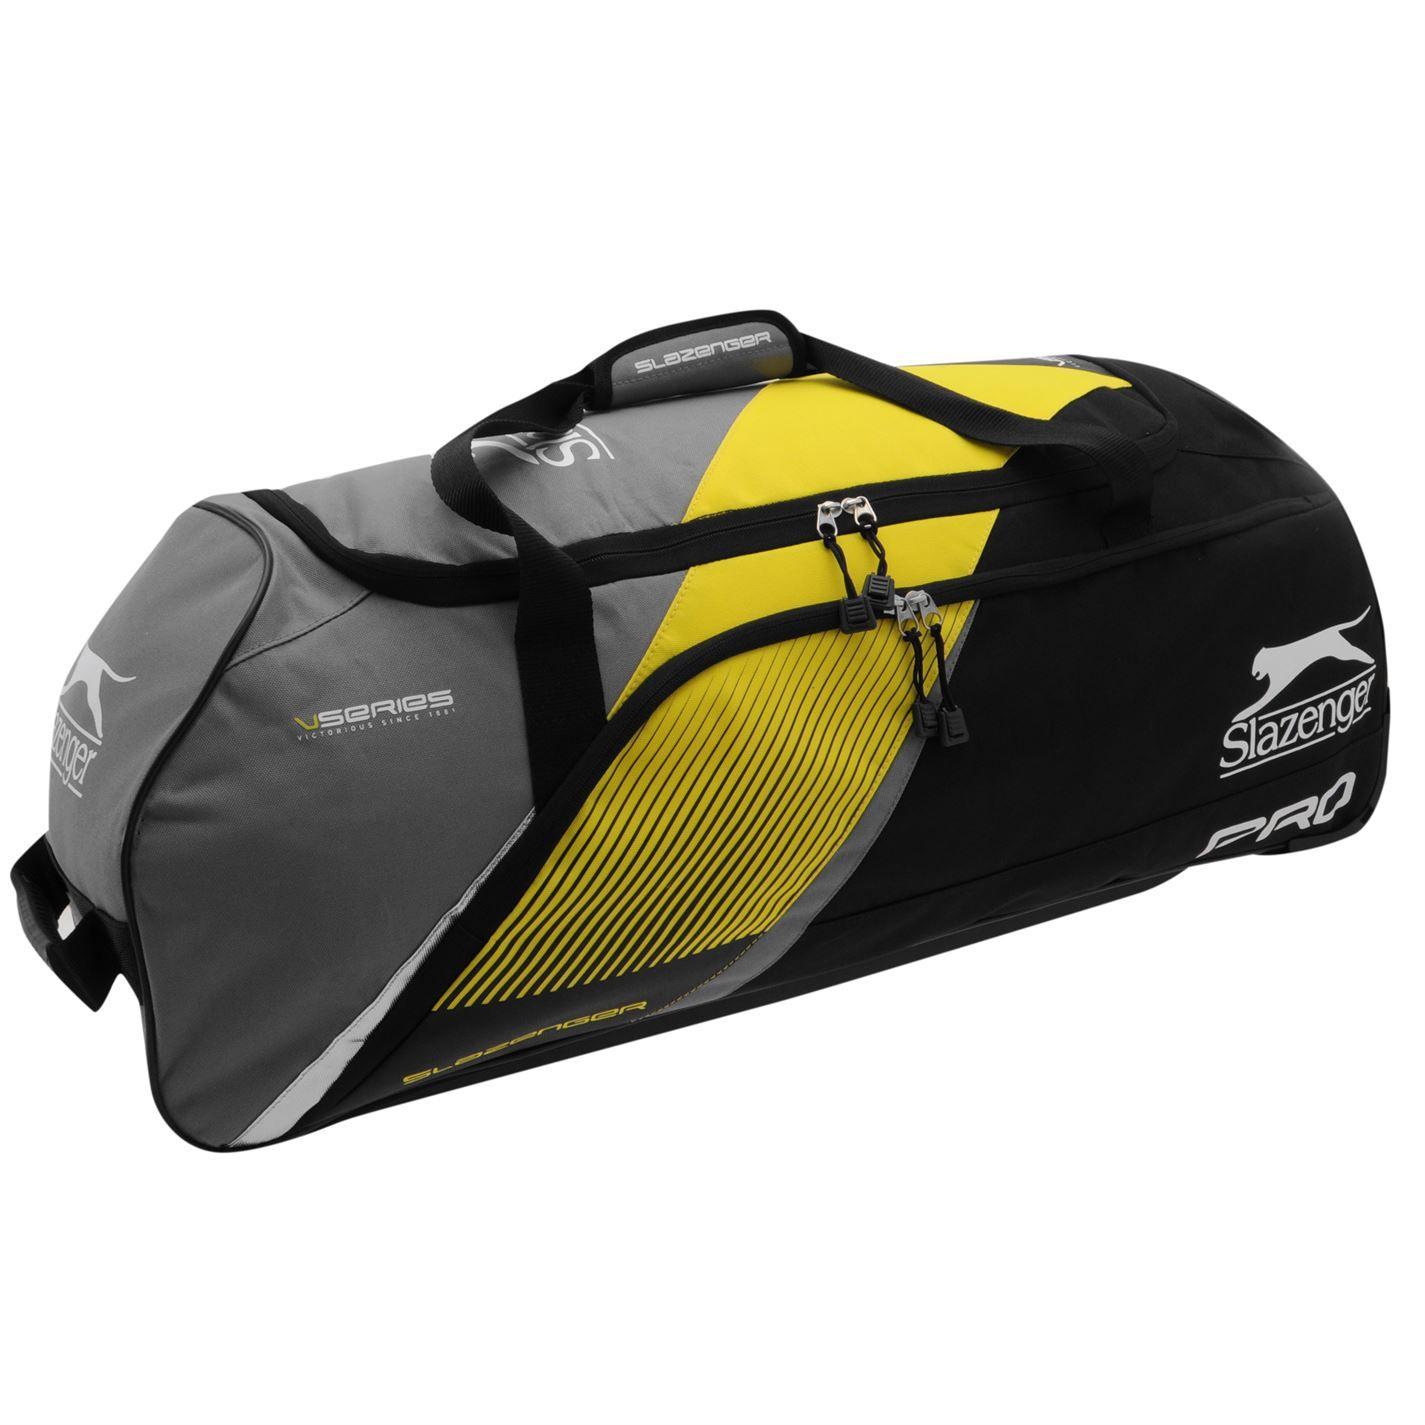 a2fa529518 Slazenger V Series Bat Cover   Cricket   Bags, Cricket, Gym Bag